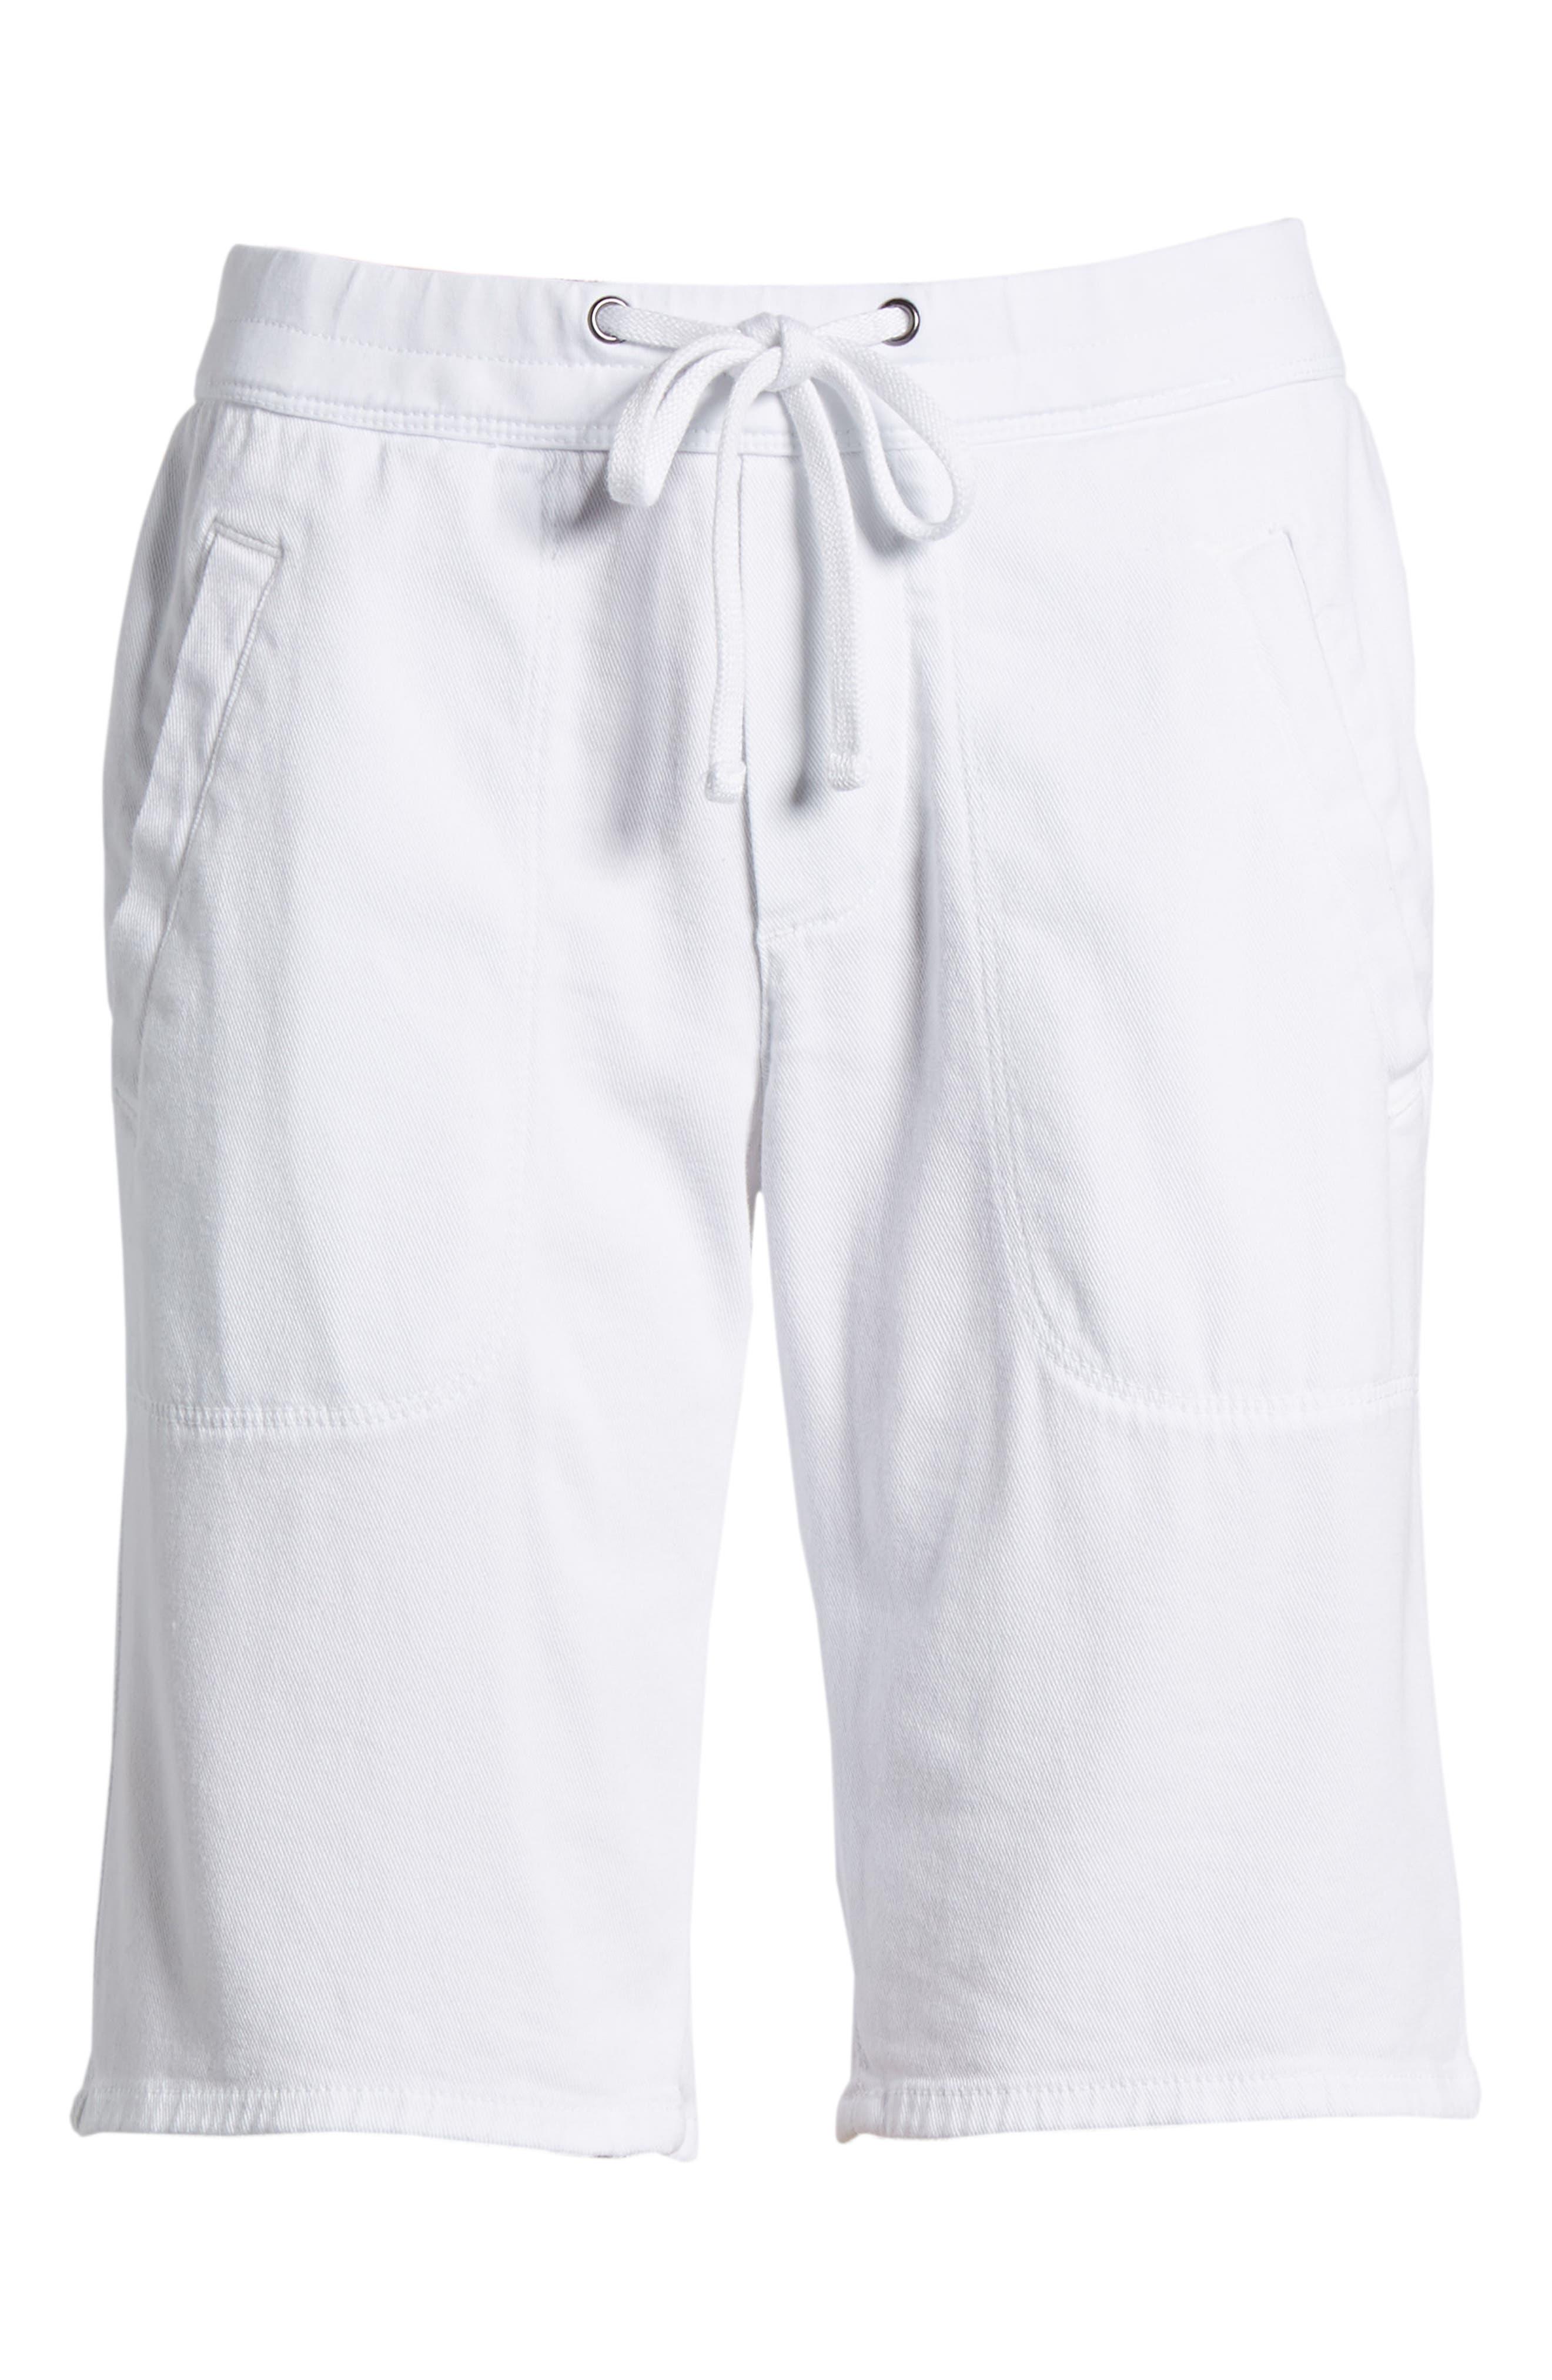 Soft Drape Utility Shorts,                         Main,                         color, White